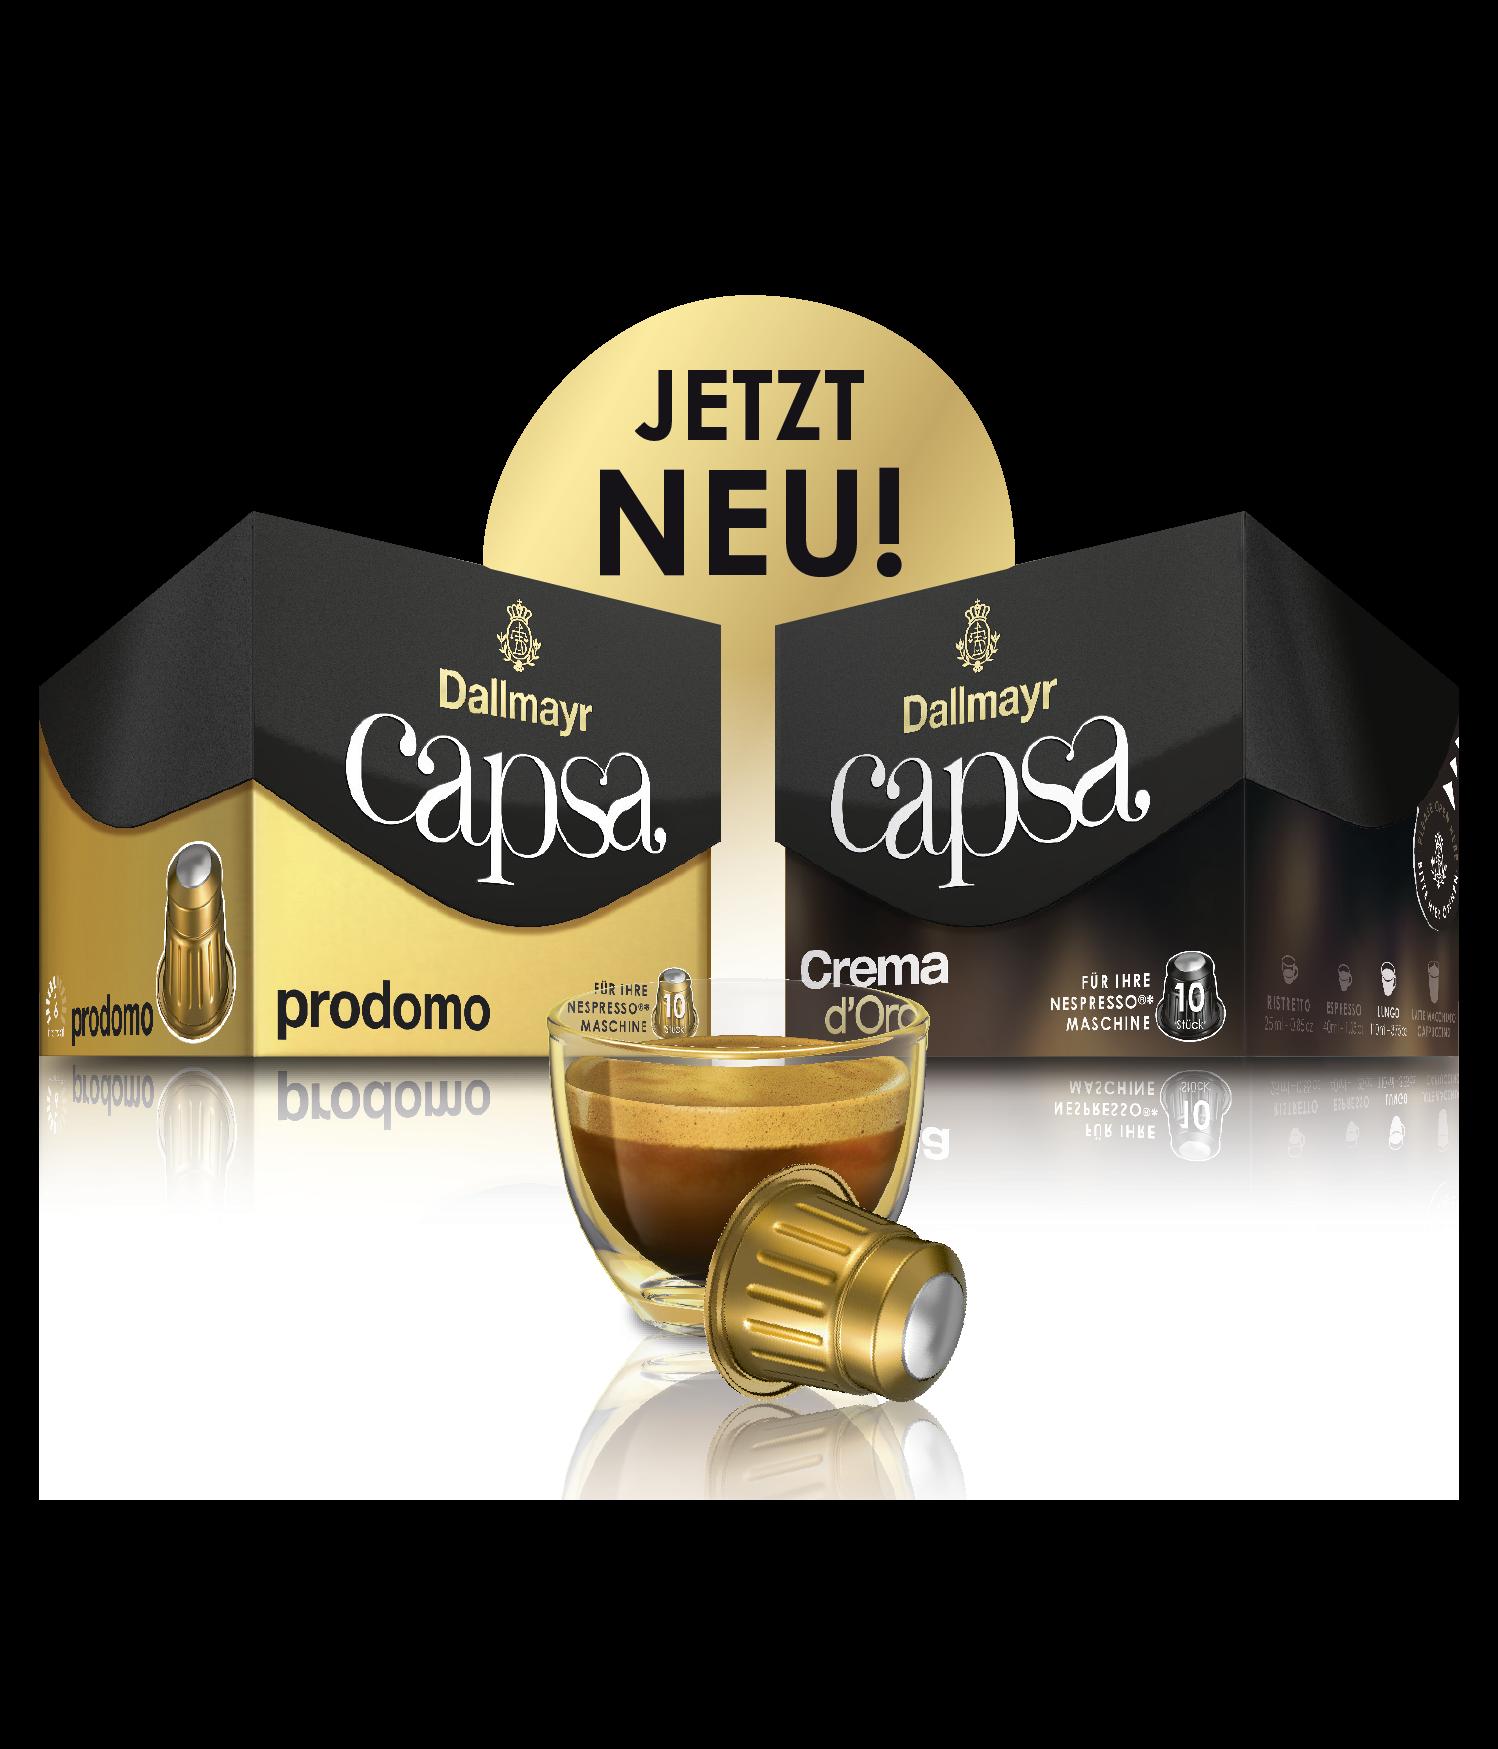 Dallmayr Capsa prodomo und Crema d'Oro: Dallmayr Klassiker